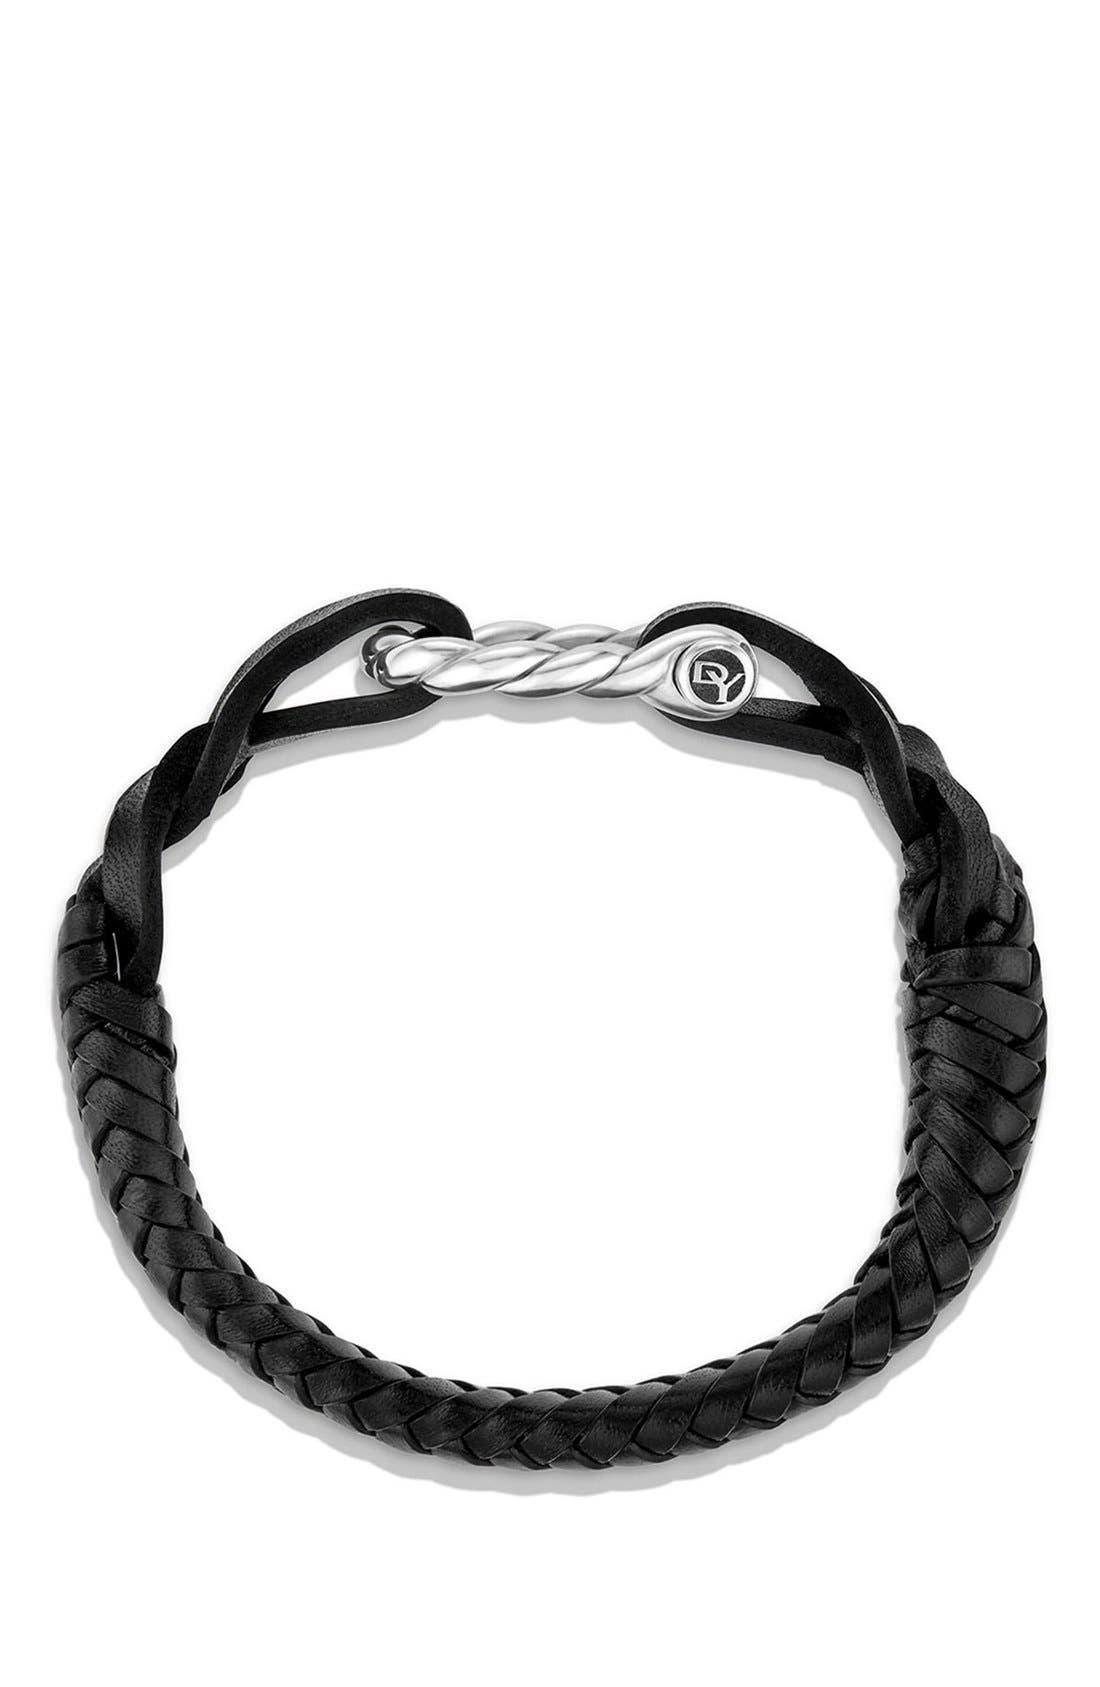 DAVID YURMAN, 'Maritime' Leather Woven Shackle Bracelet, Alternate thumbnail 3, color, SILVER/ BLACK